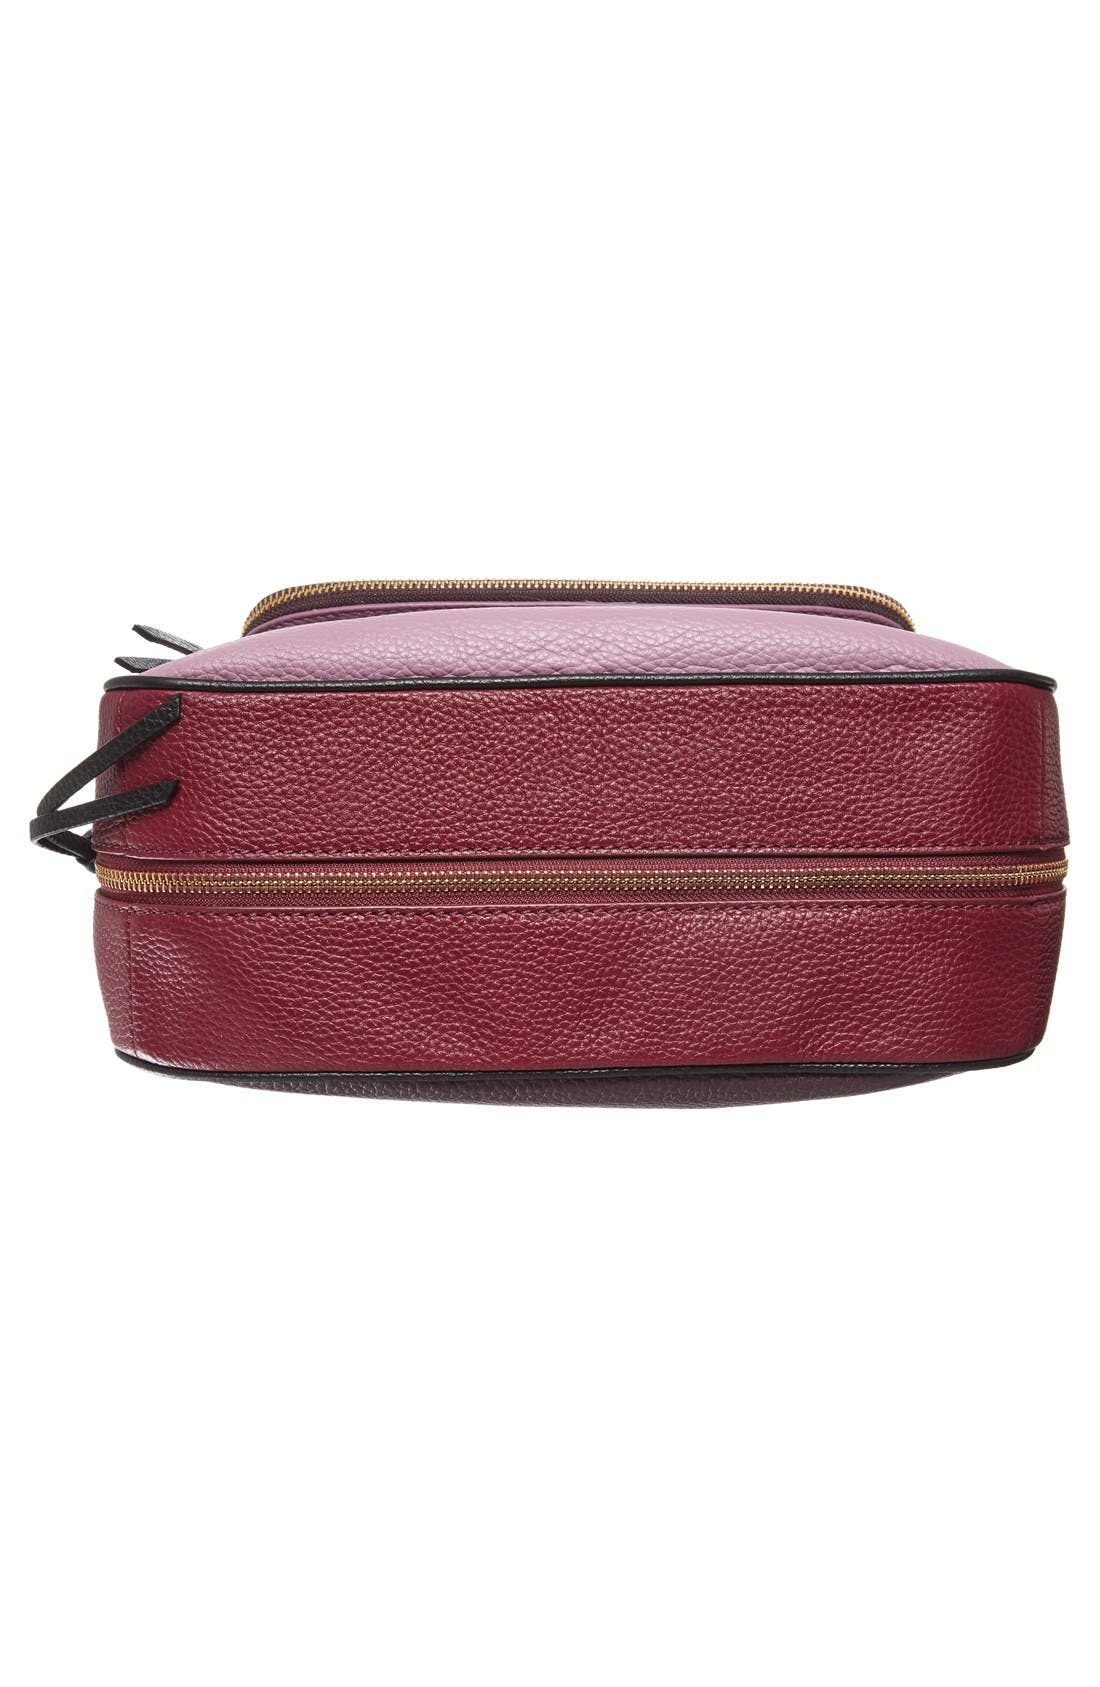 cobble hill - deva leather crossbody bag,                             Alternate thumbnail 43, color,